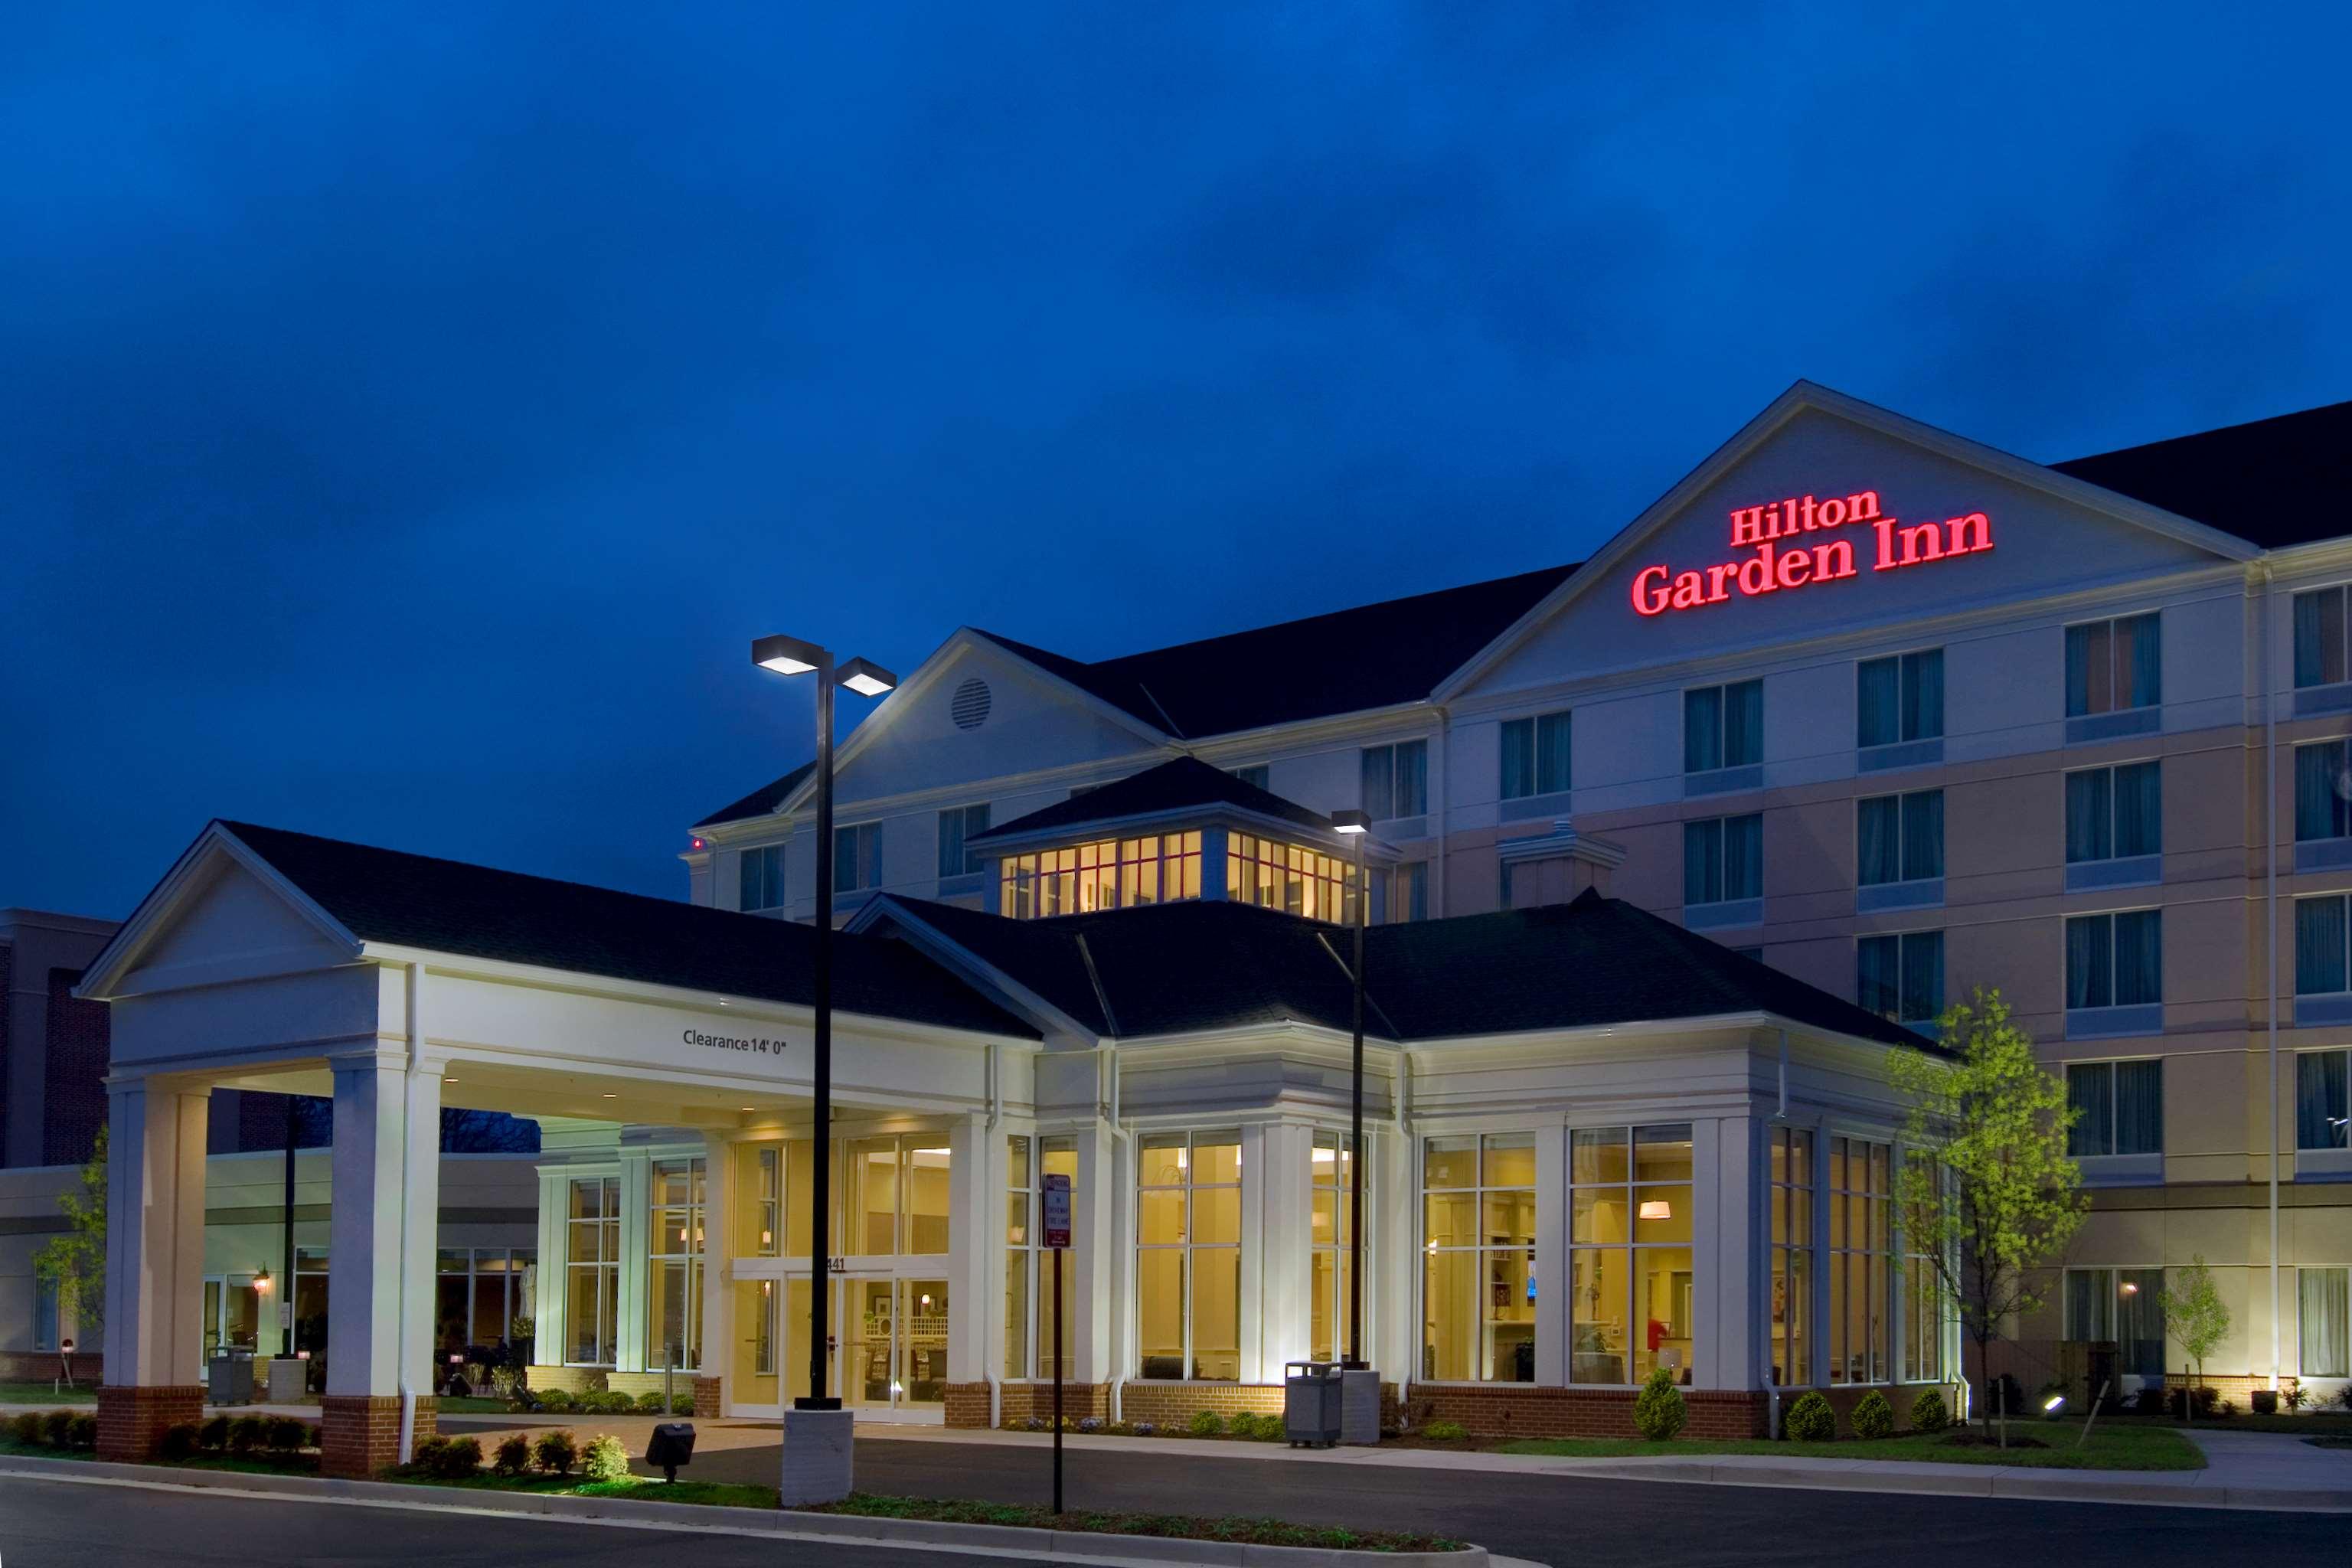 Hilton Garden Inn Richmond Airport image 1